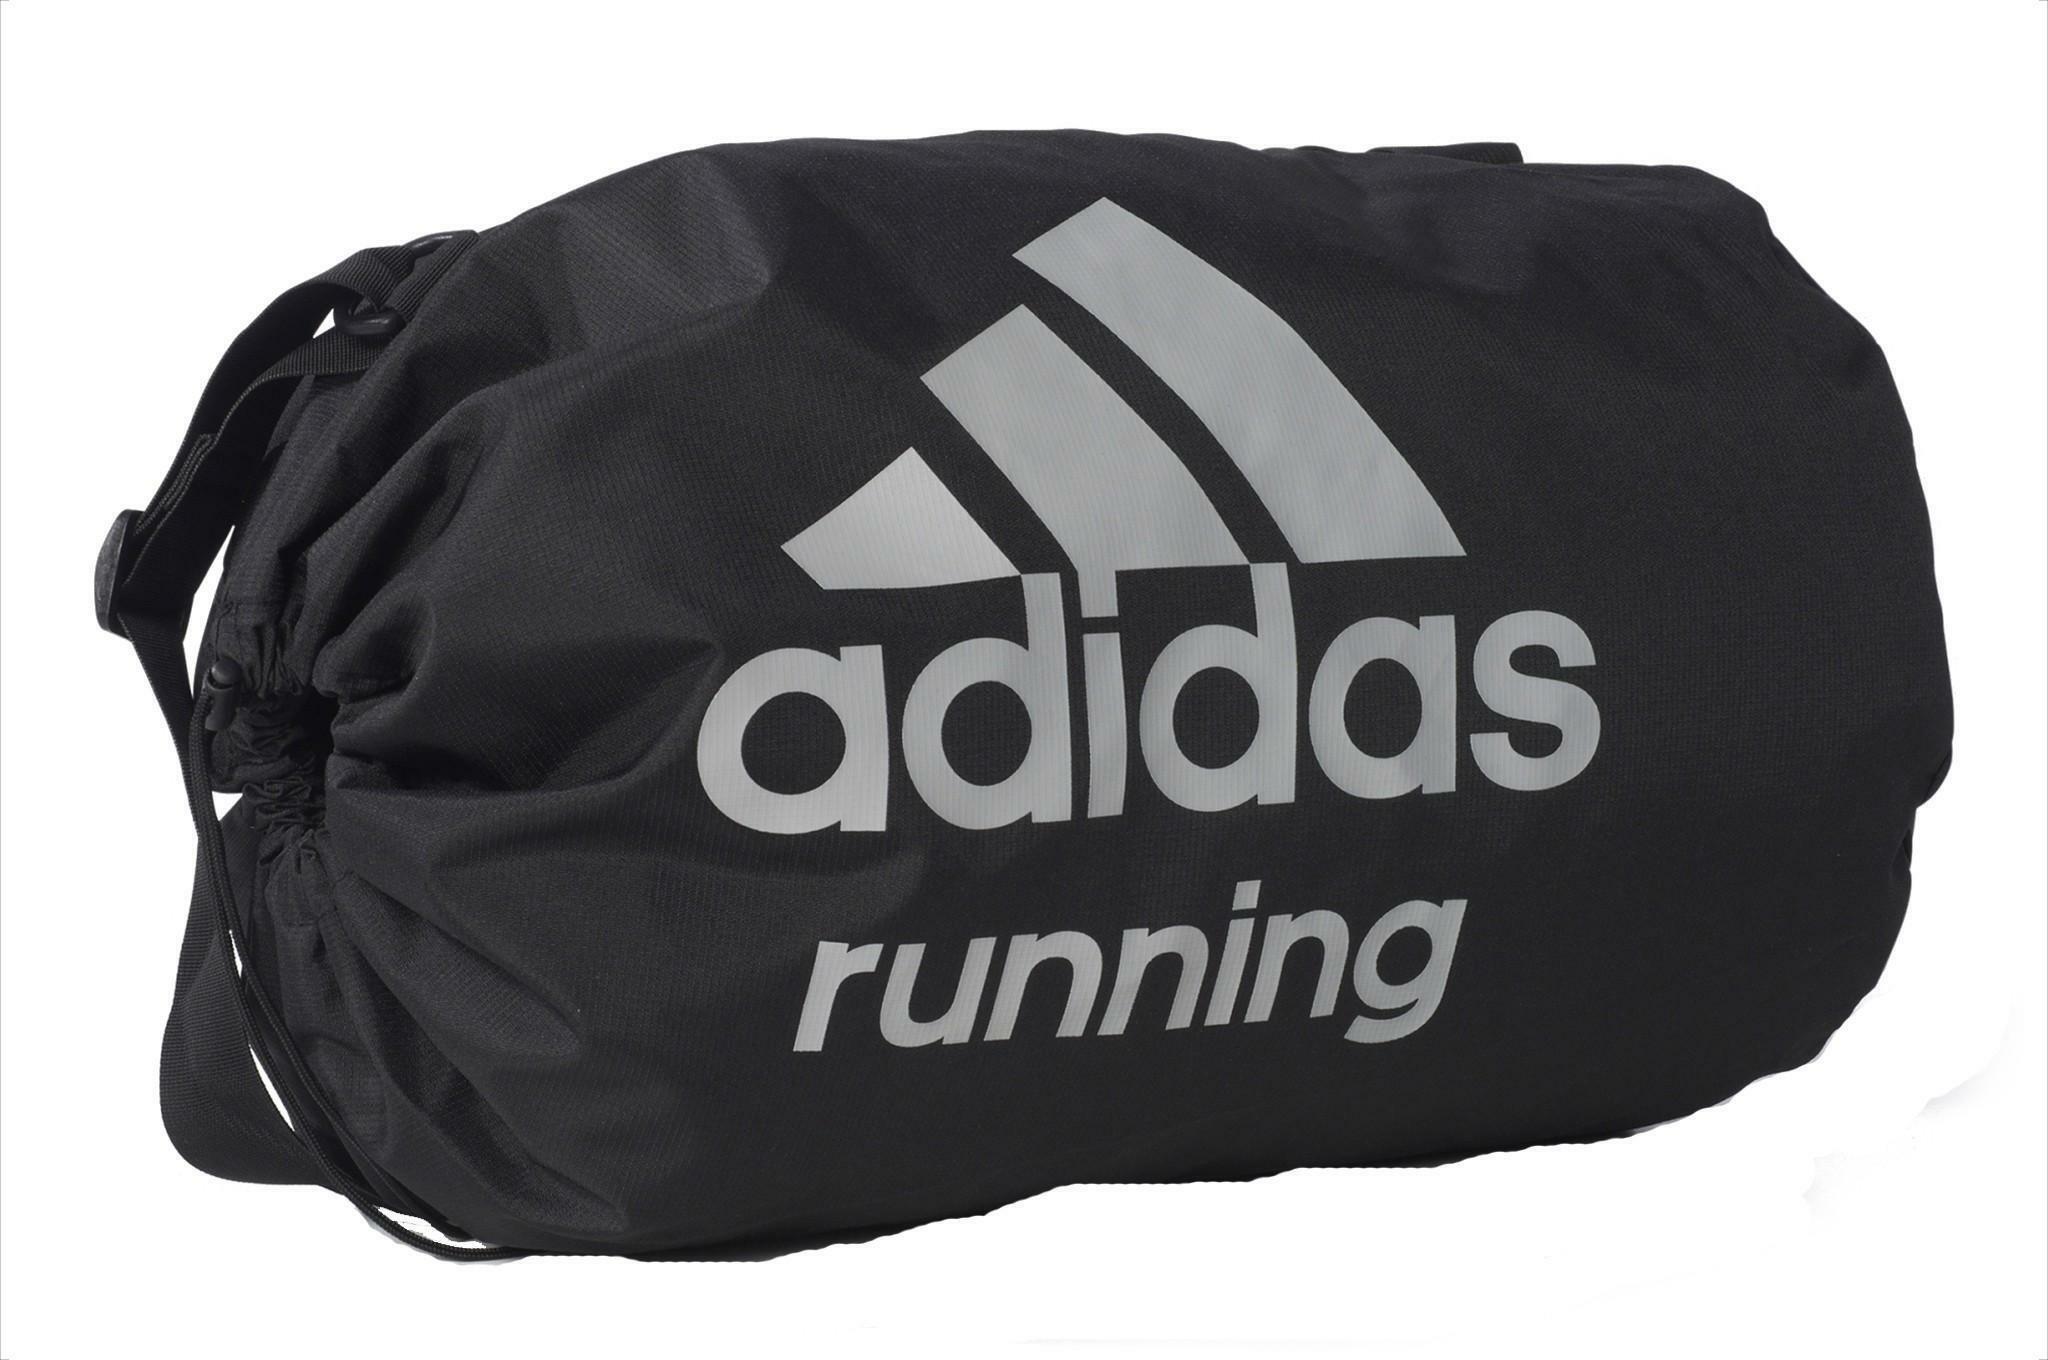 adidas adidas run bag borsone nero